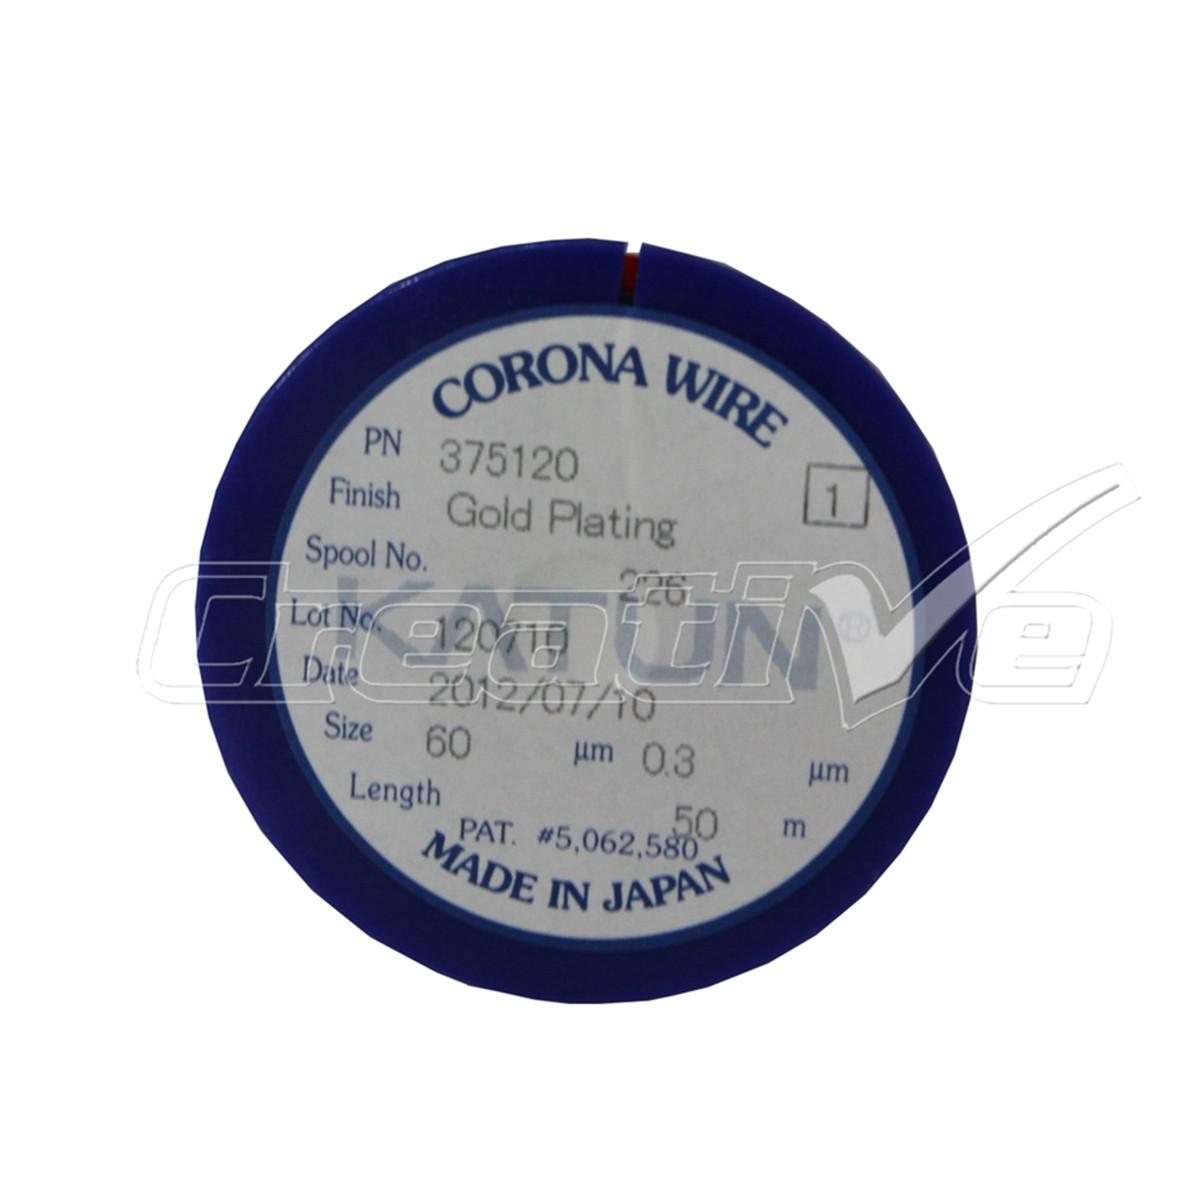 Bobina de Fio Corona Universal 50 metros FY3-0040-000 | Katun Performance